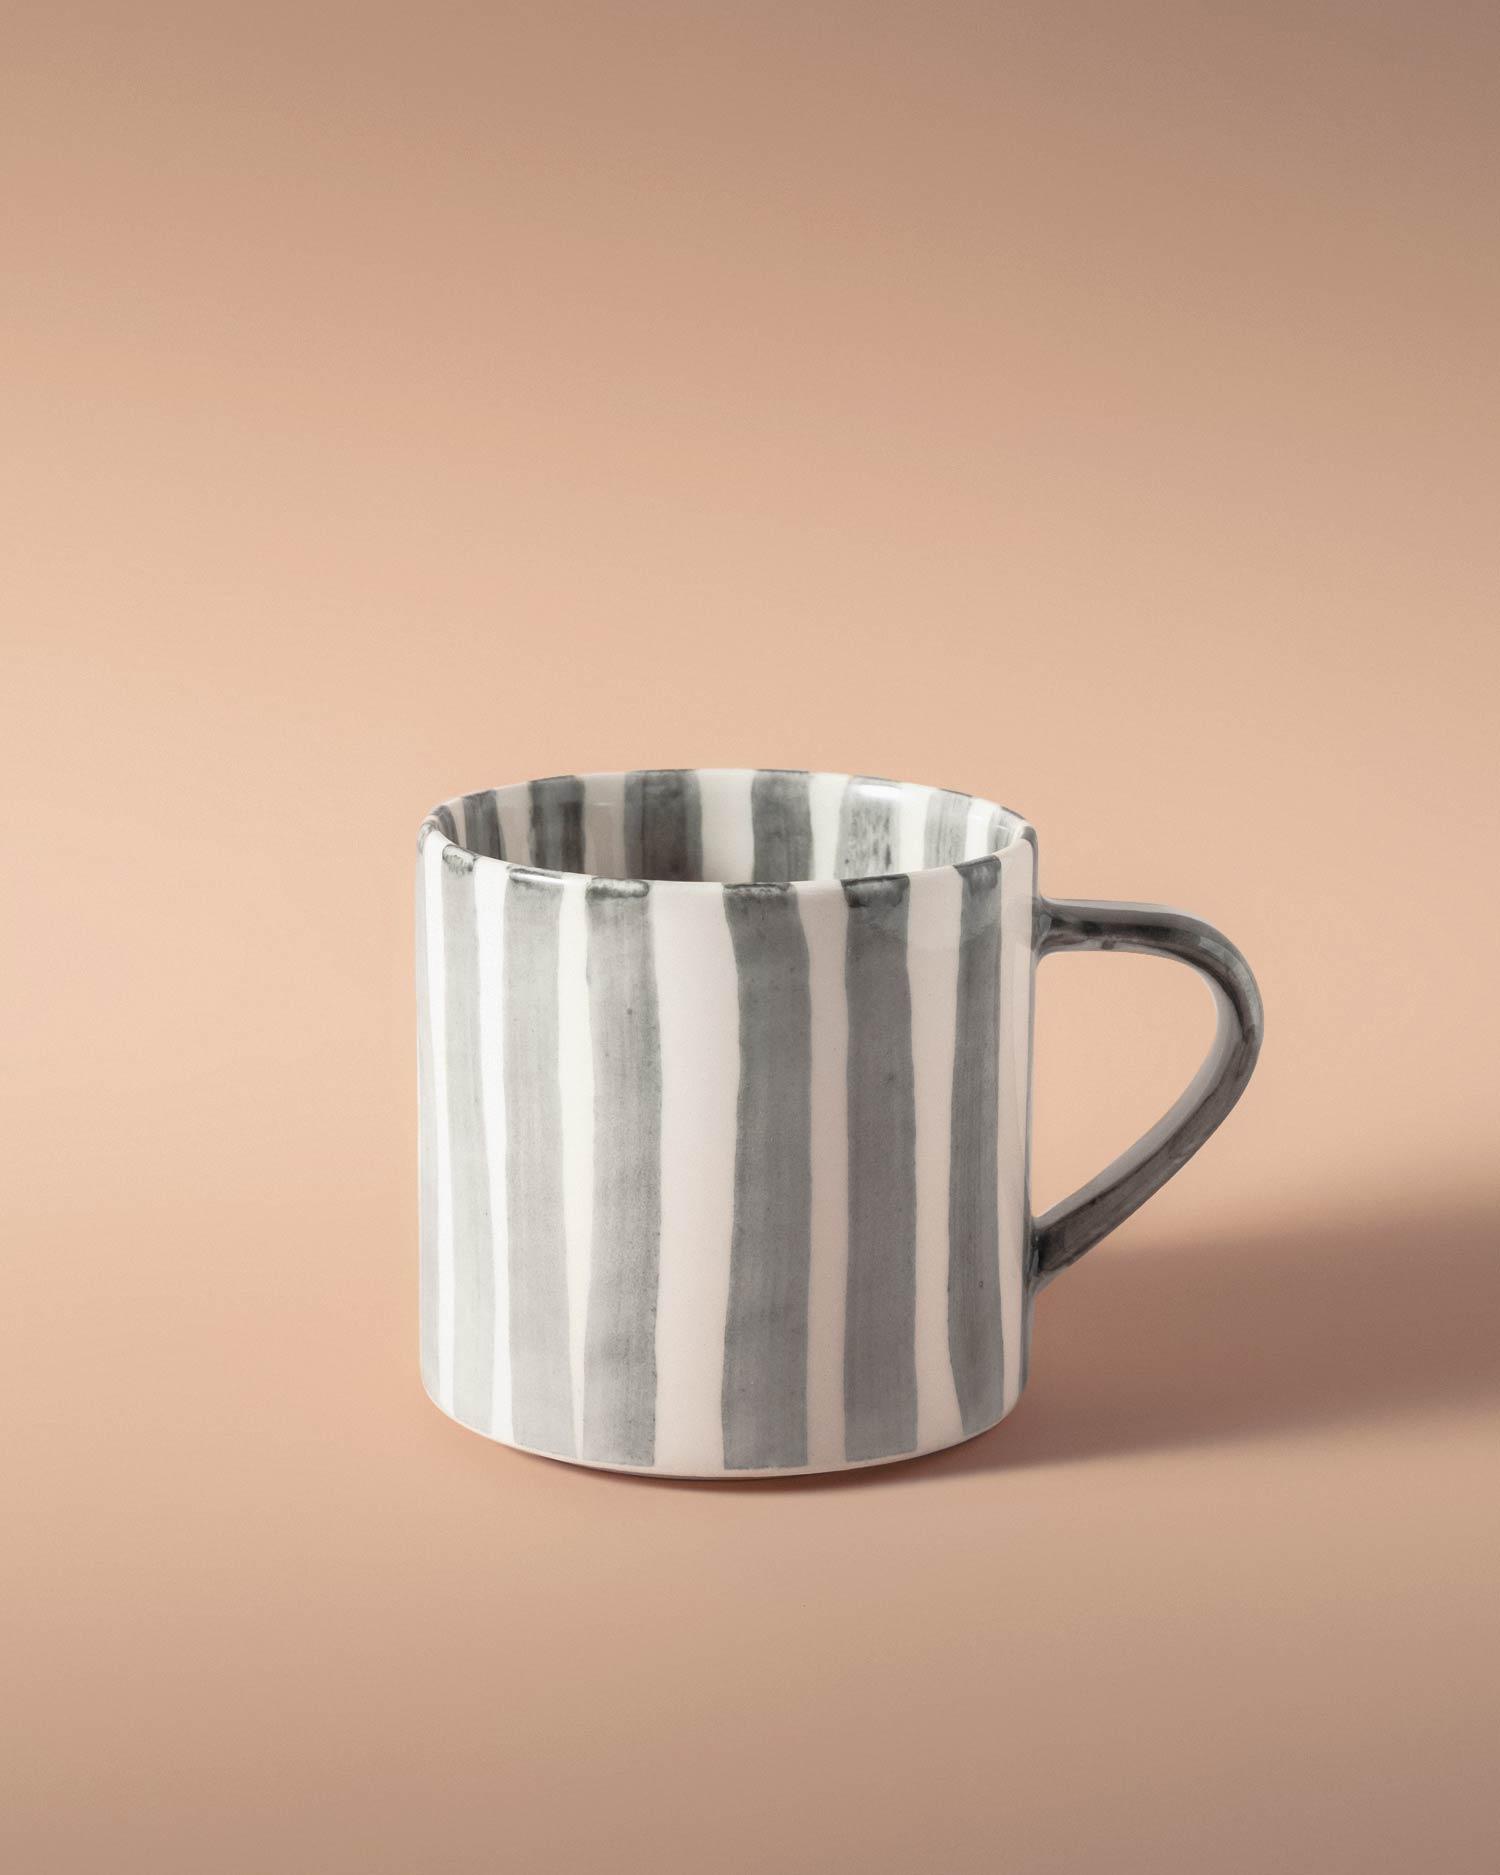 kalligrafi-coffee-cup-gray-pp-6.jpg